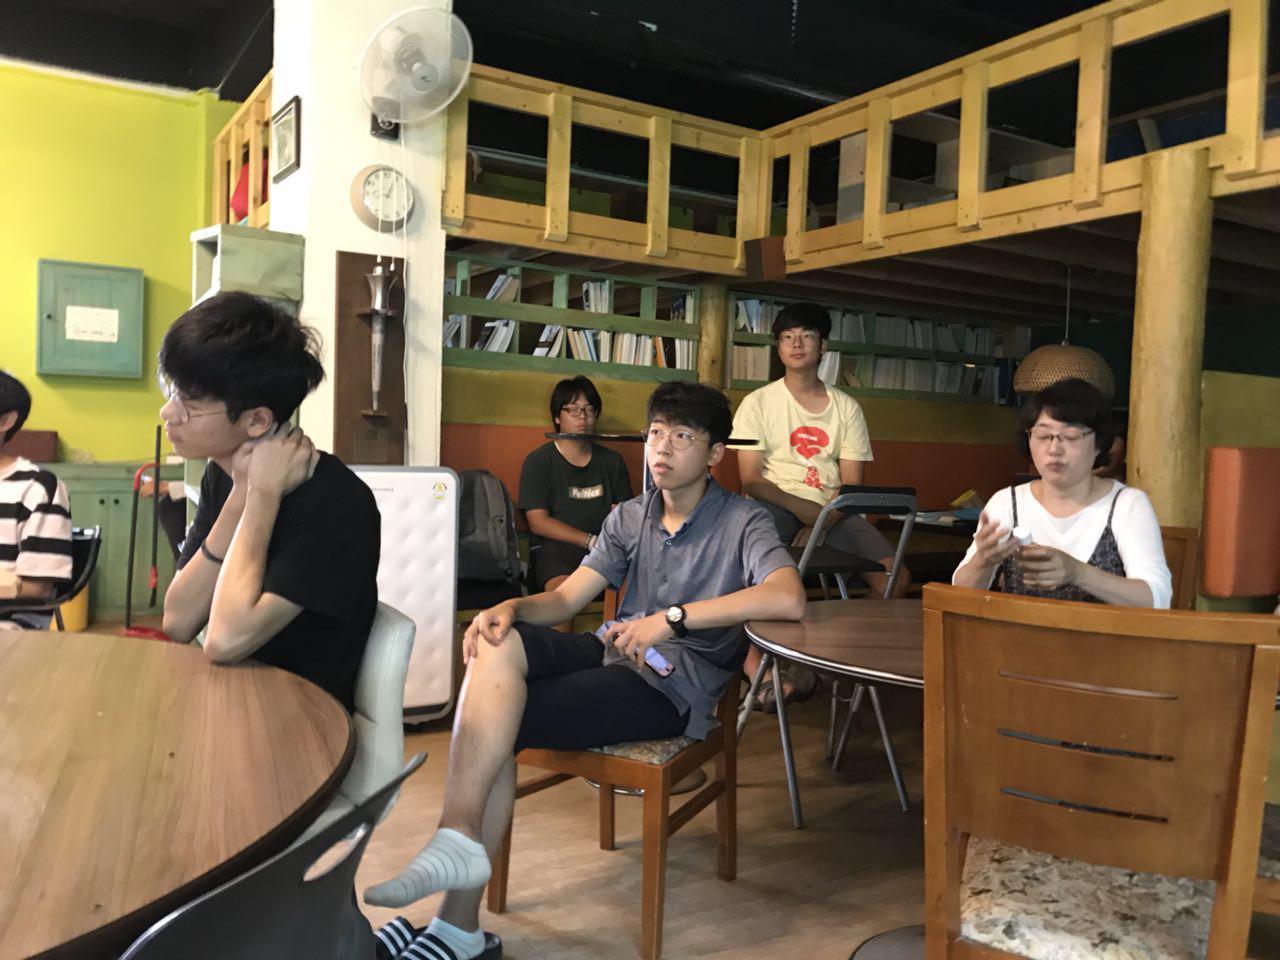 photo_2018-07-13_09-32-38.jpg